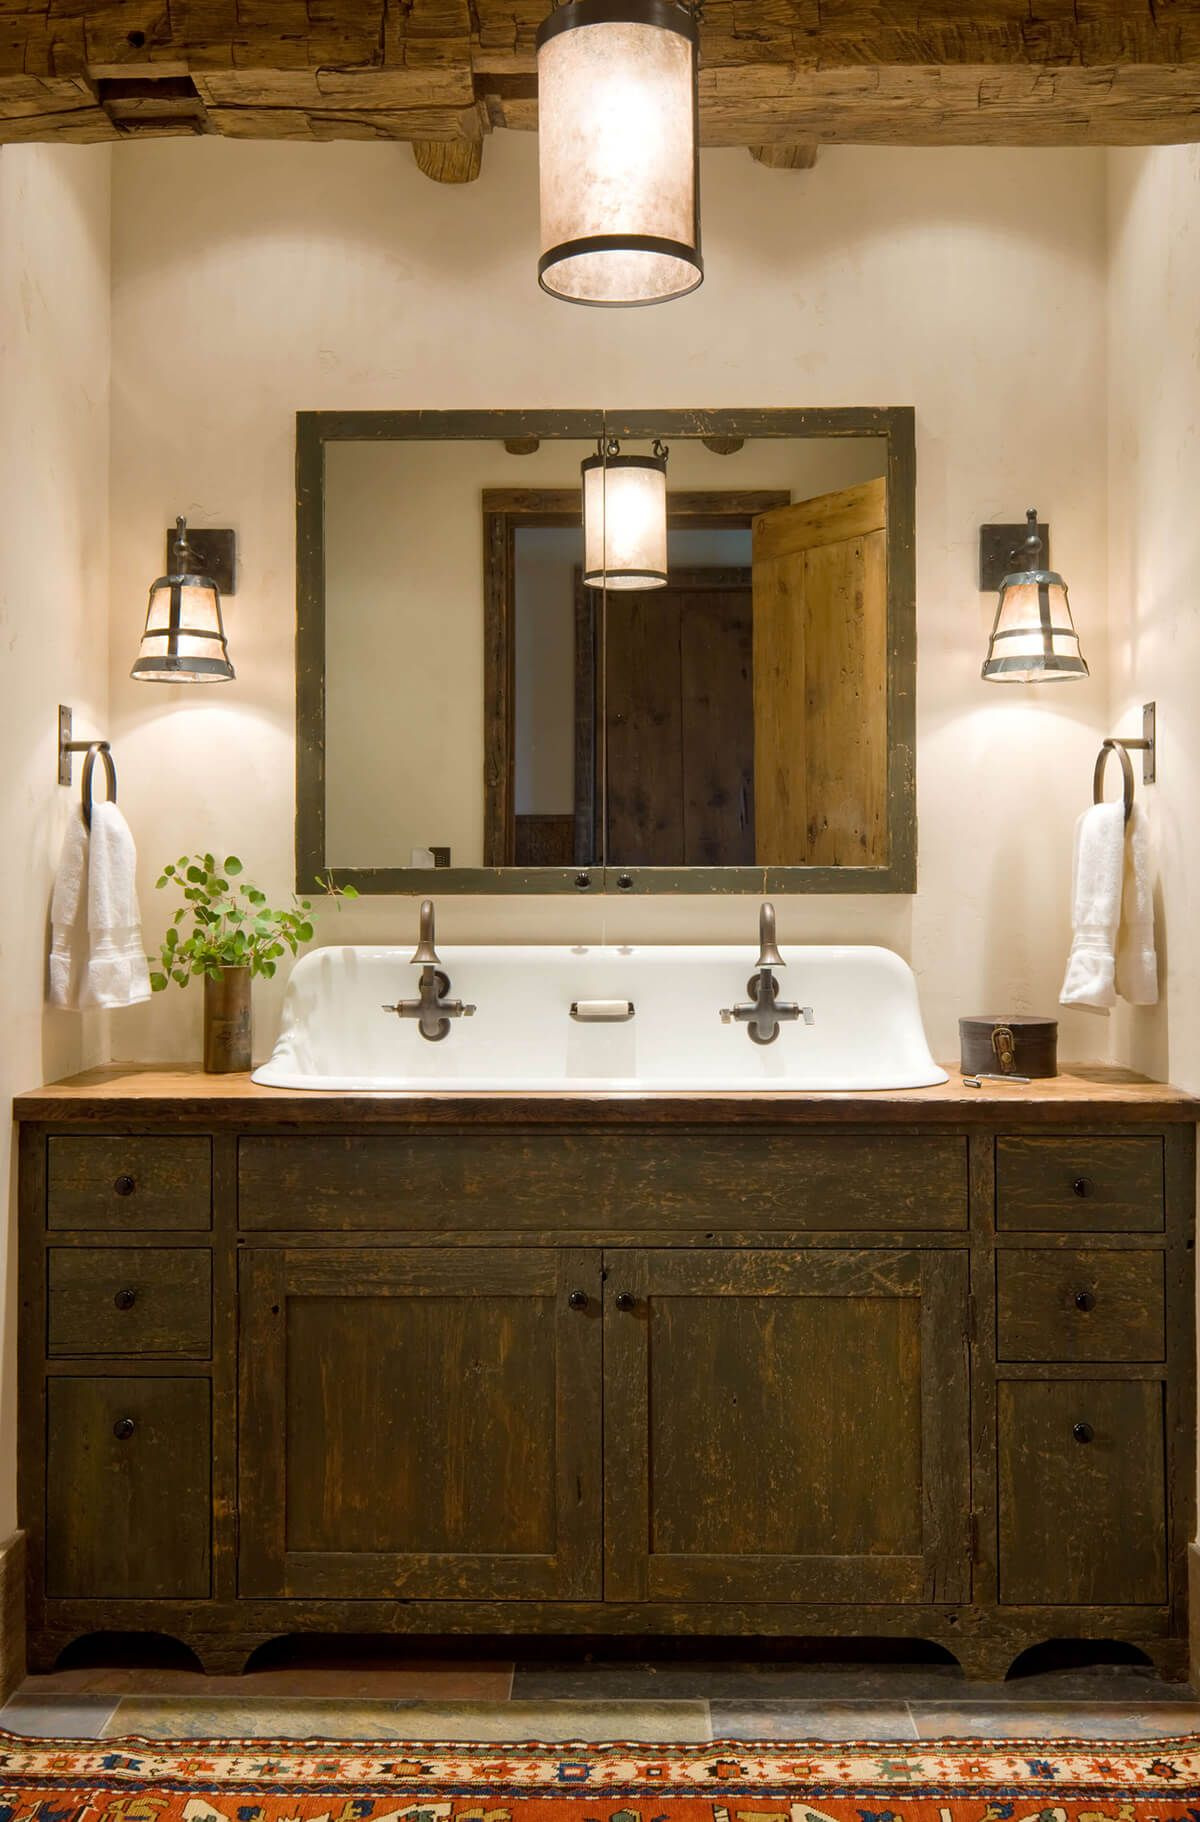 35 Rustic Bathroom Vanity Ideas to Inspire Your Next ...